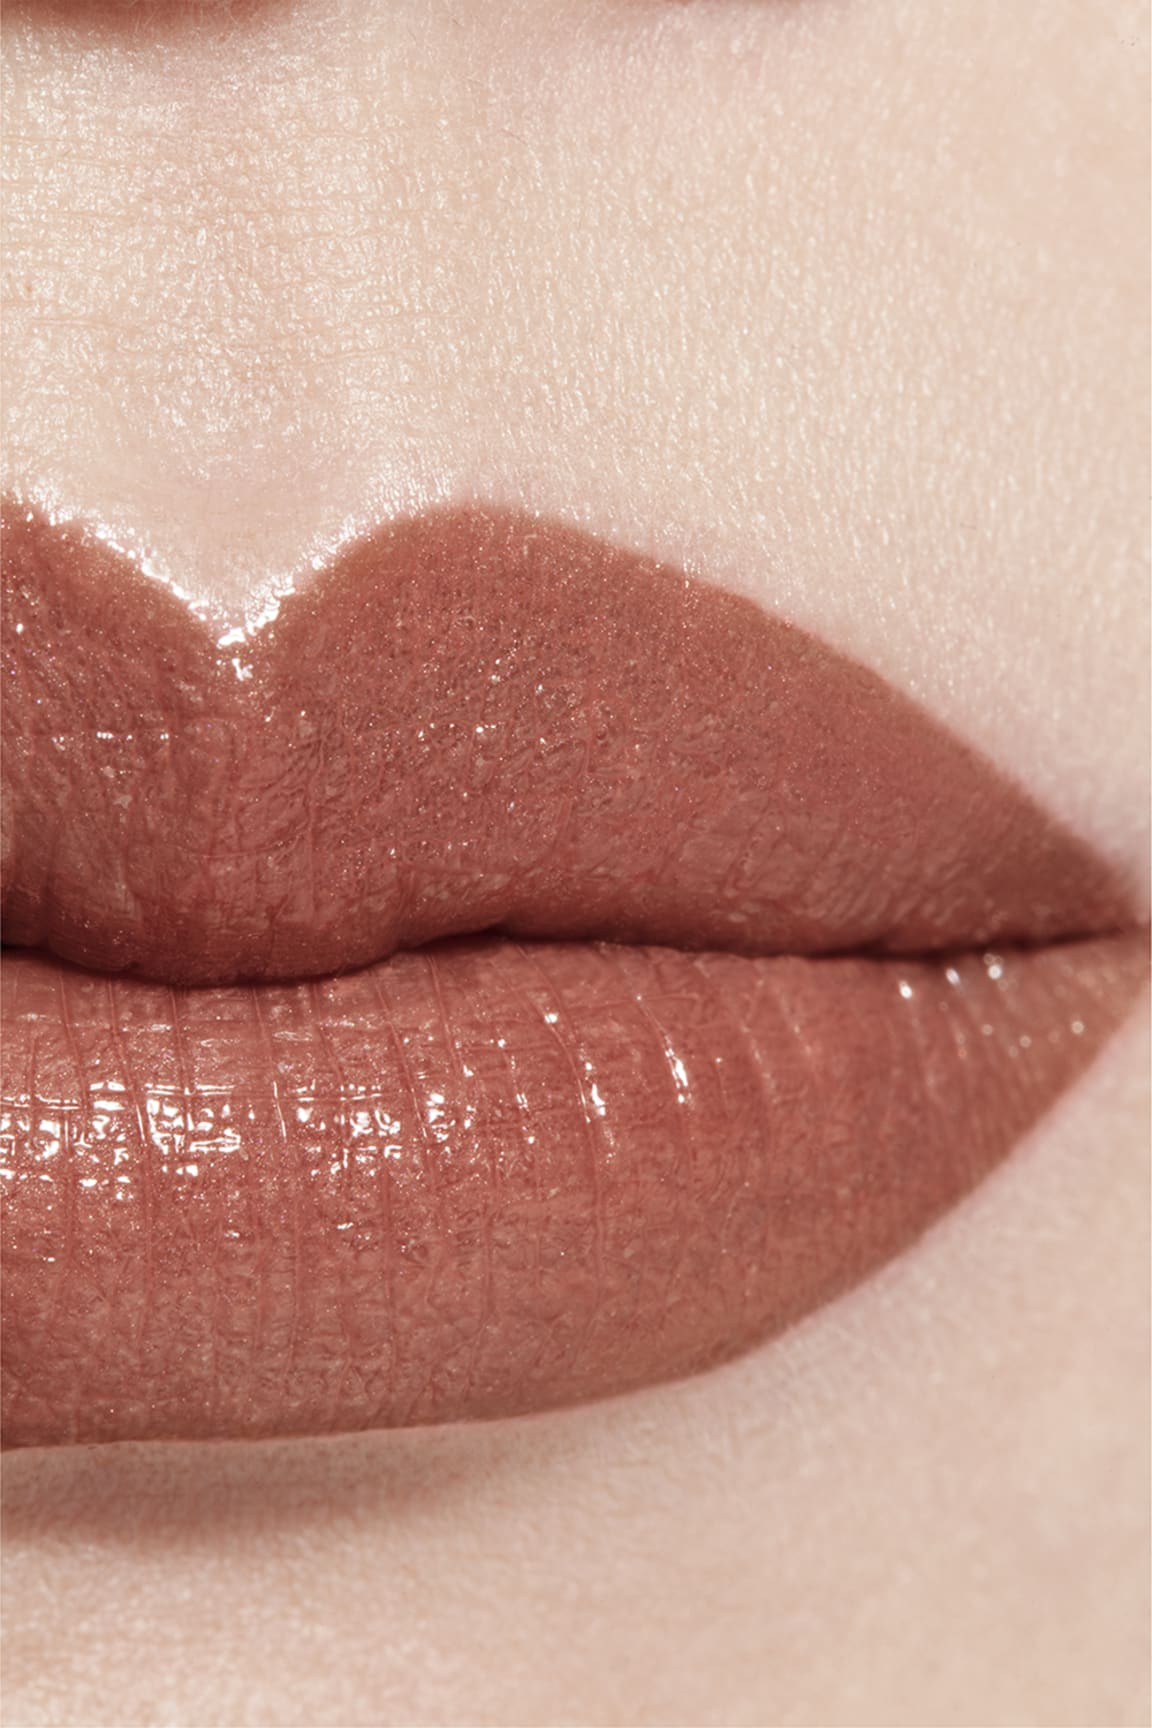 Imagen aplicación de maquillaje 1 - ROUGE ALLURE 174 - ROUGE ANGÉLIQUE